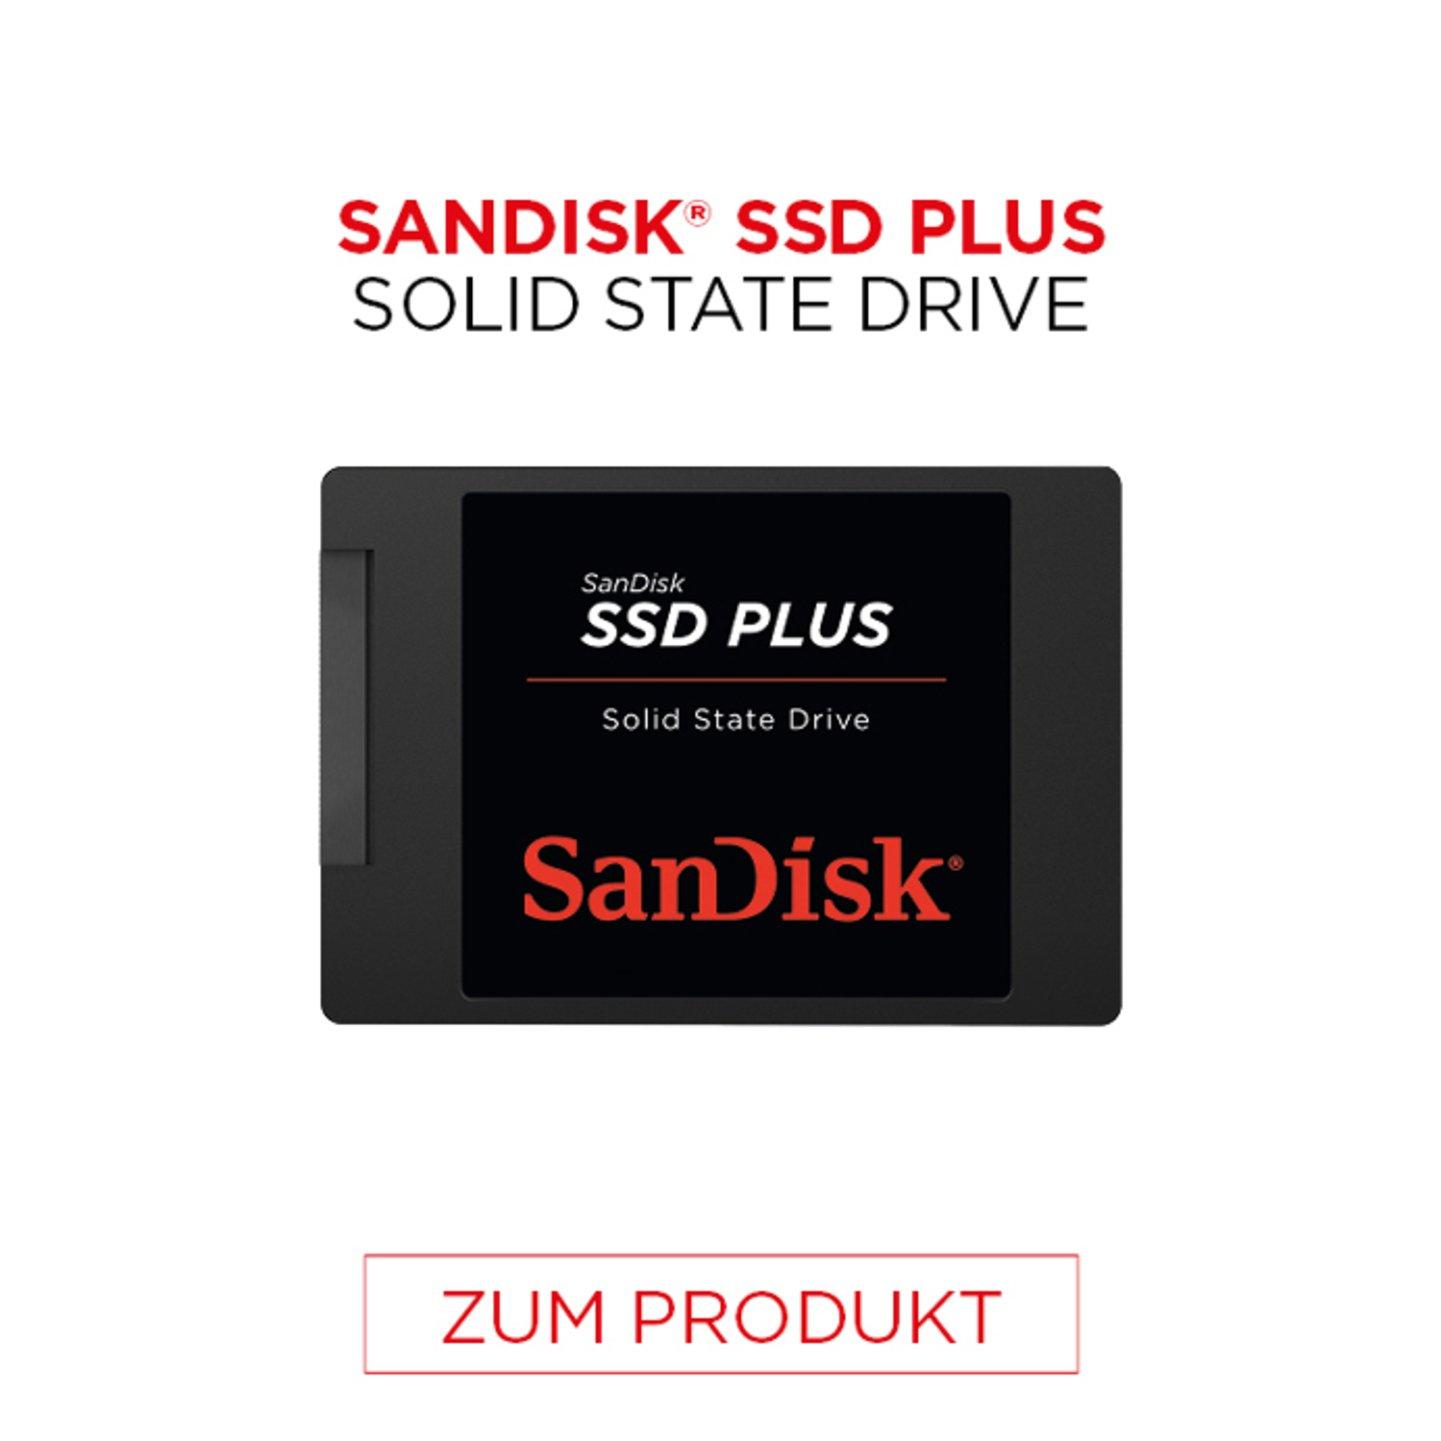 Sandisk SSD Plus